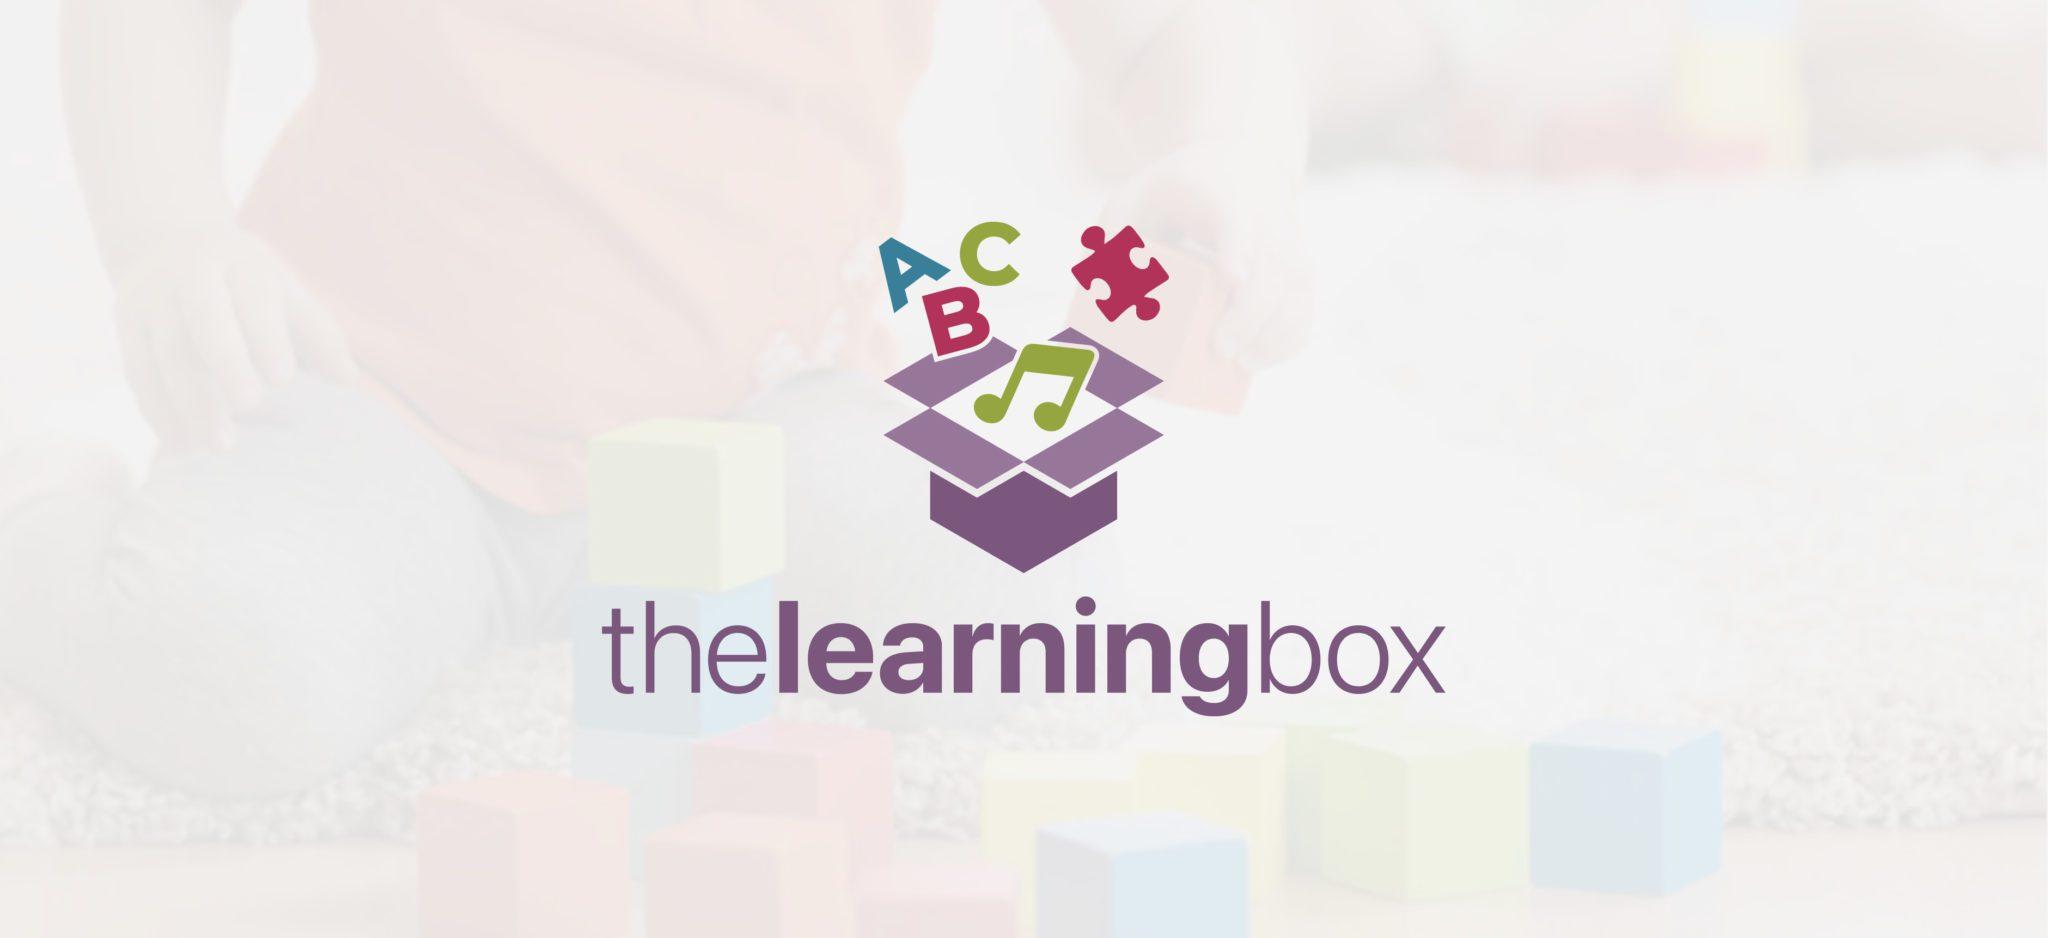 The Learning Box Full Logo | Brand Identity Design